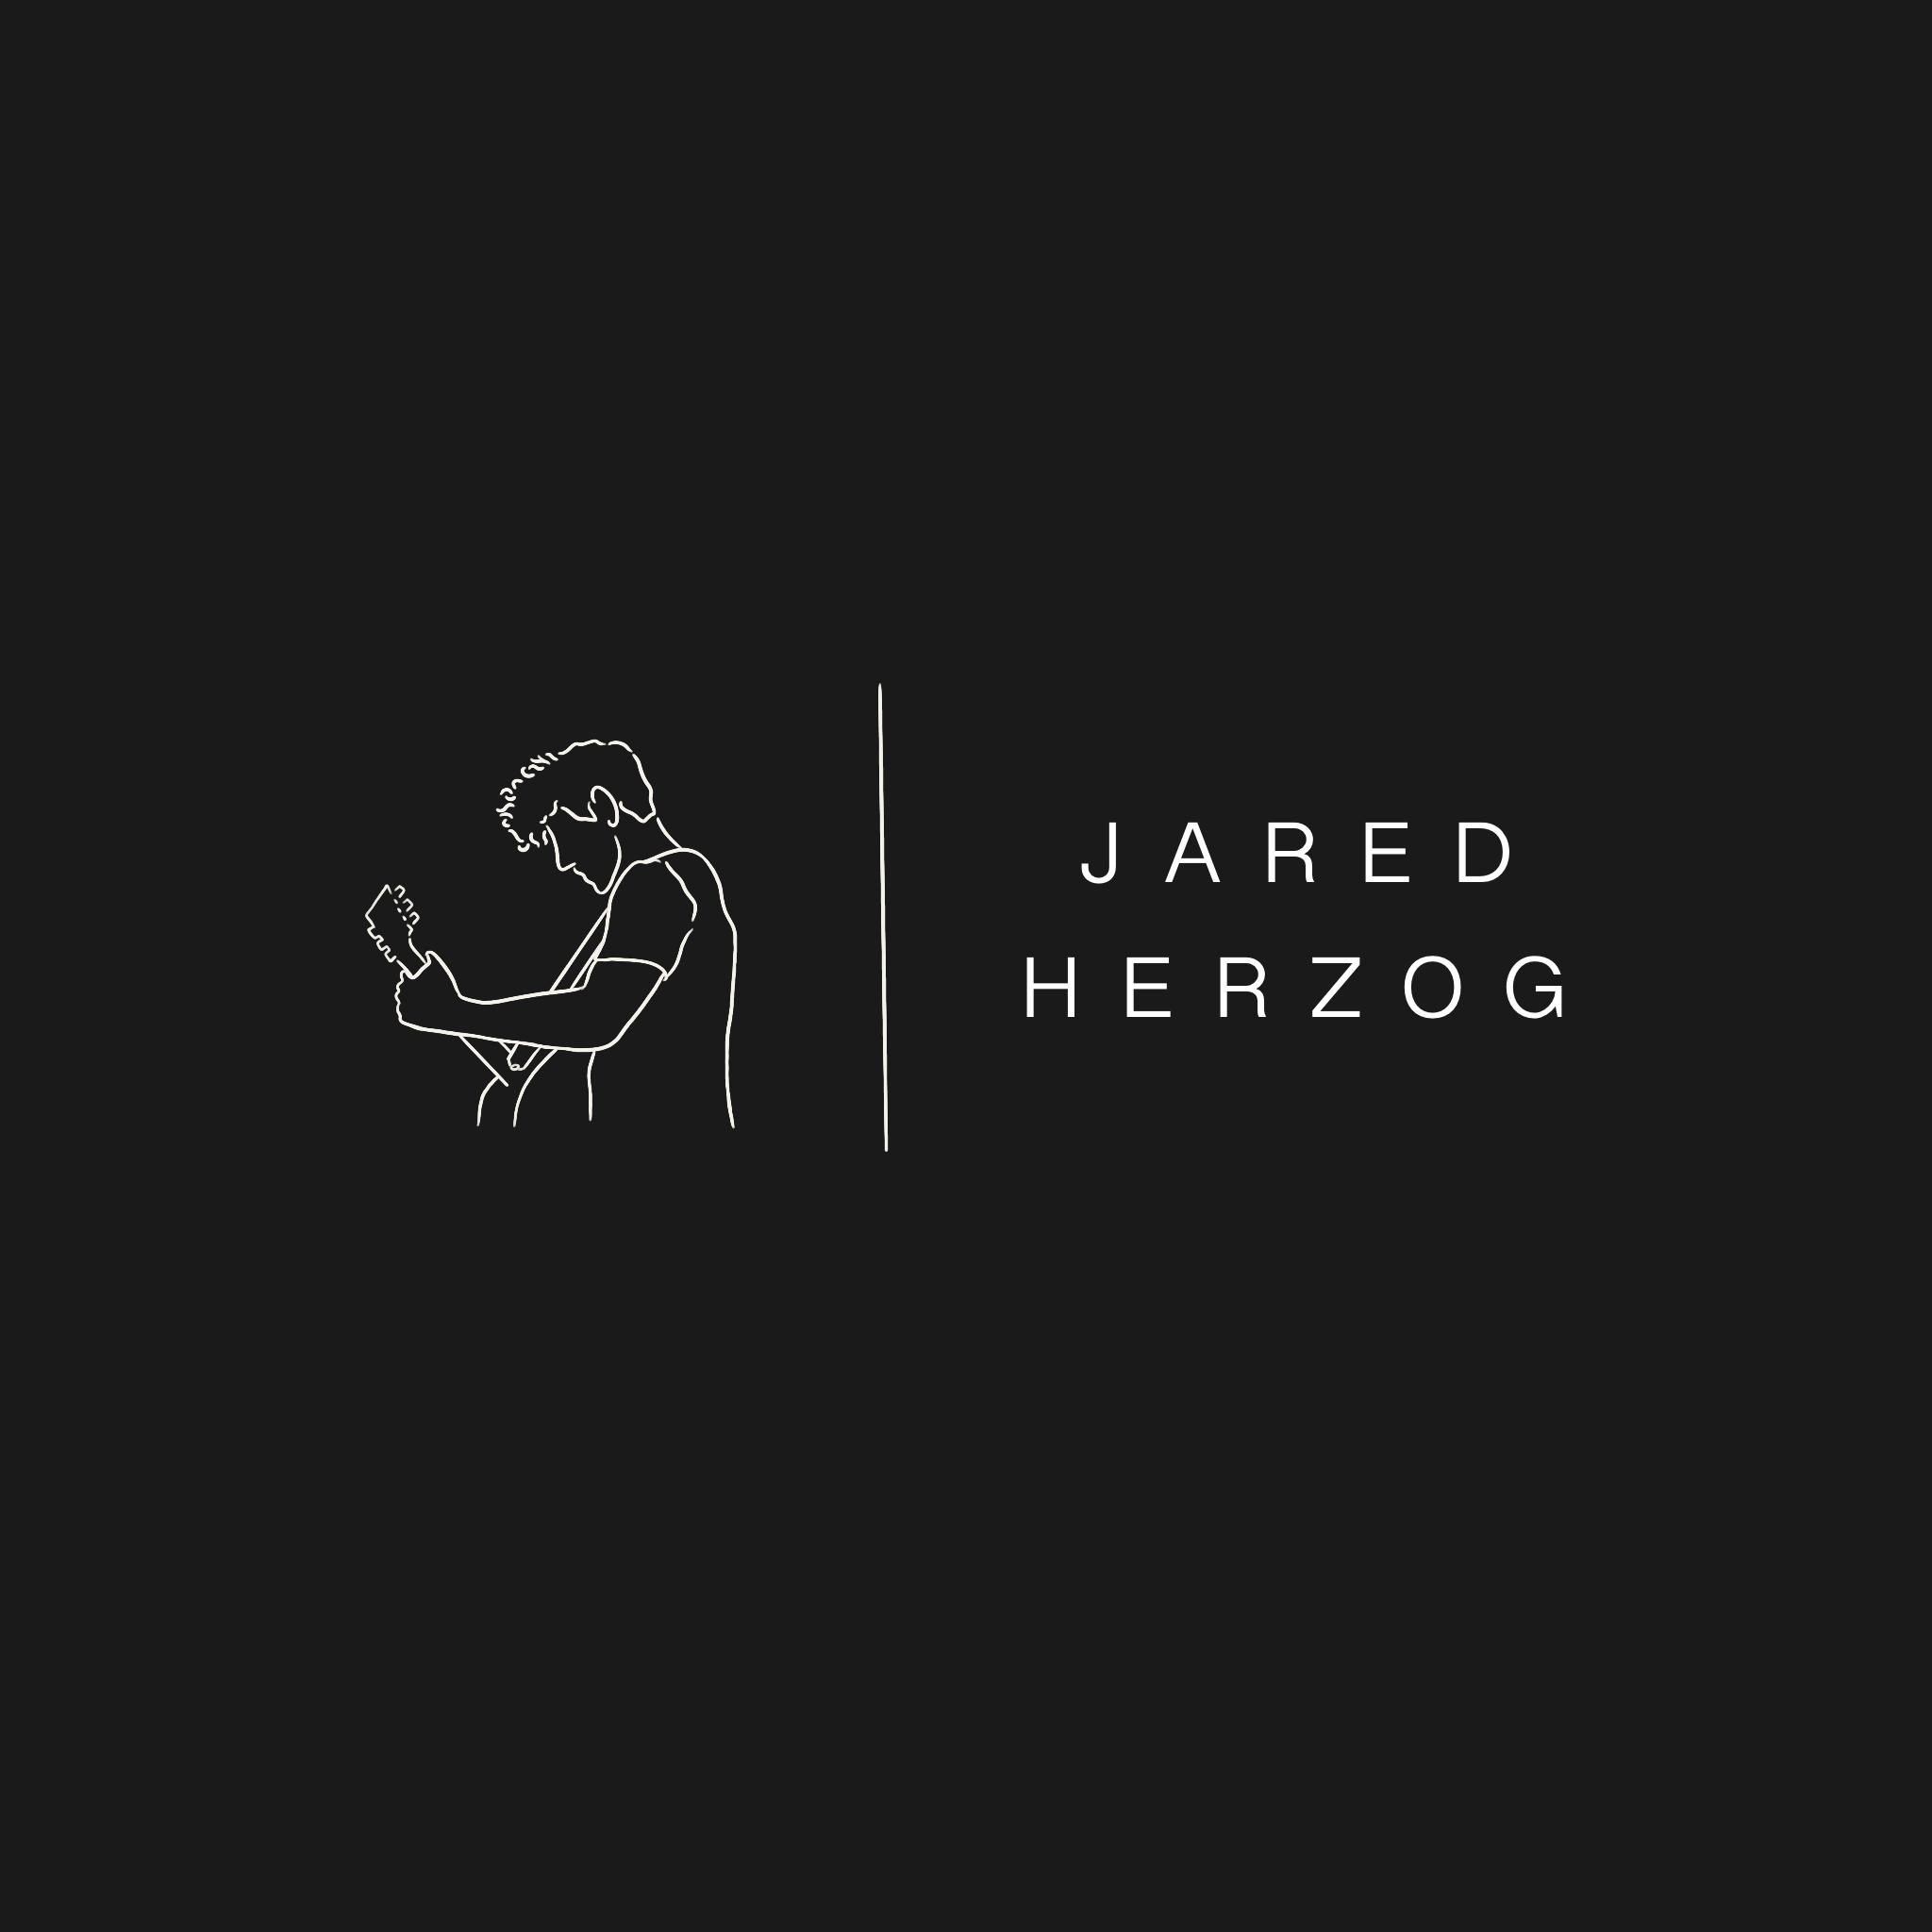 photo of Jared Herzog